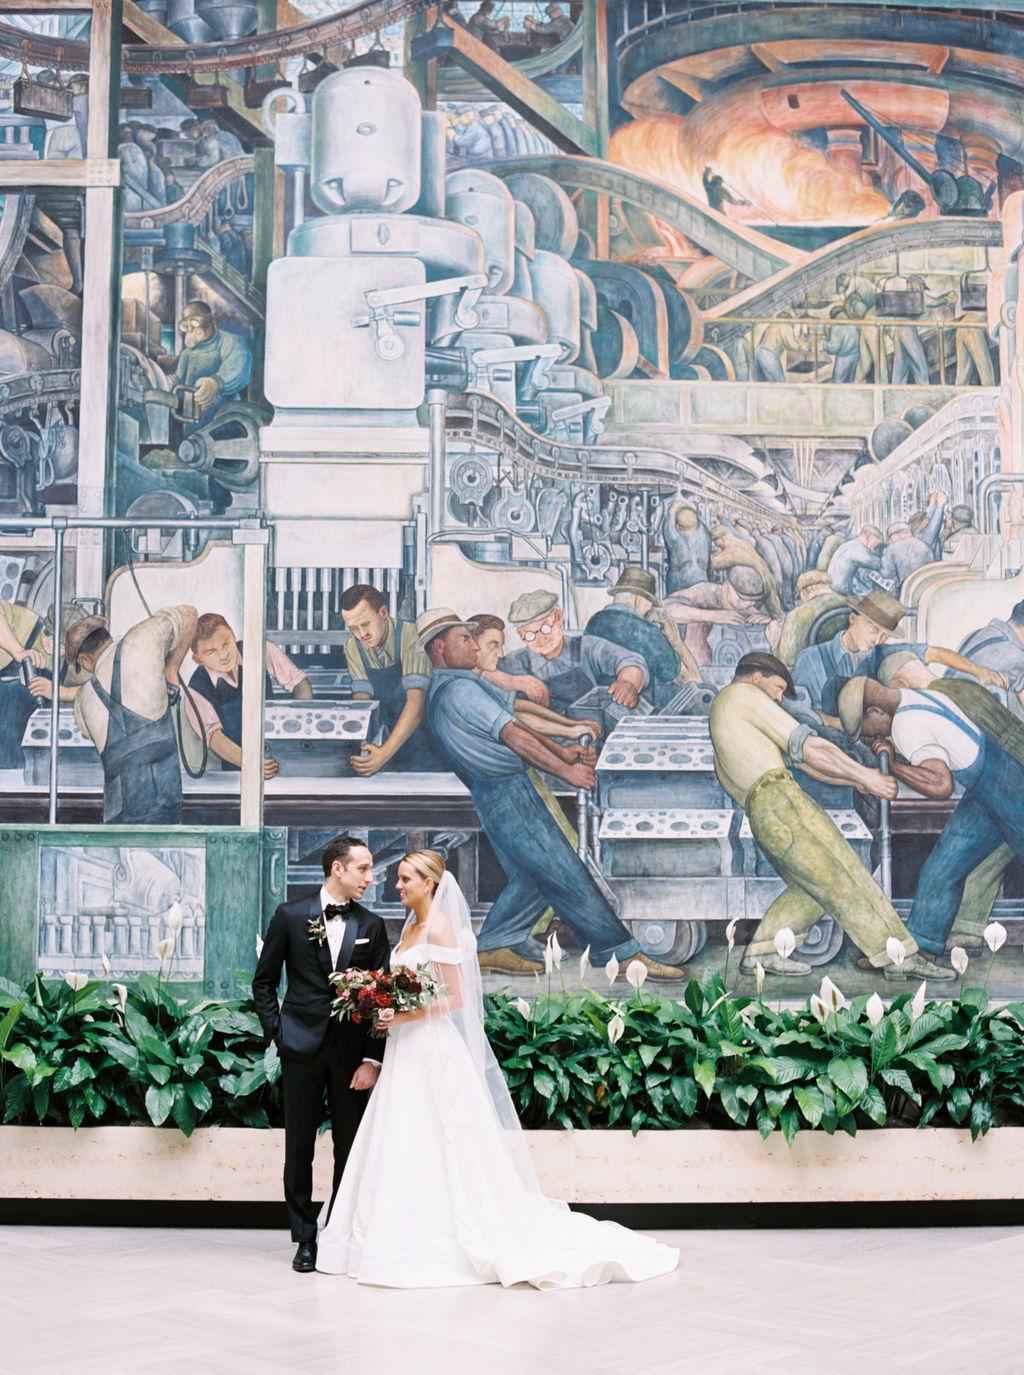 Kyle-Menna-Wedding-krmorenophoto-390.jpg